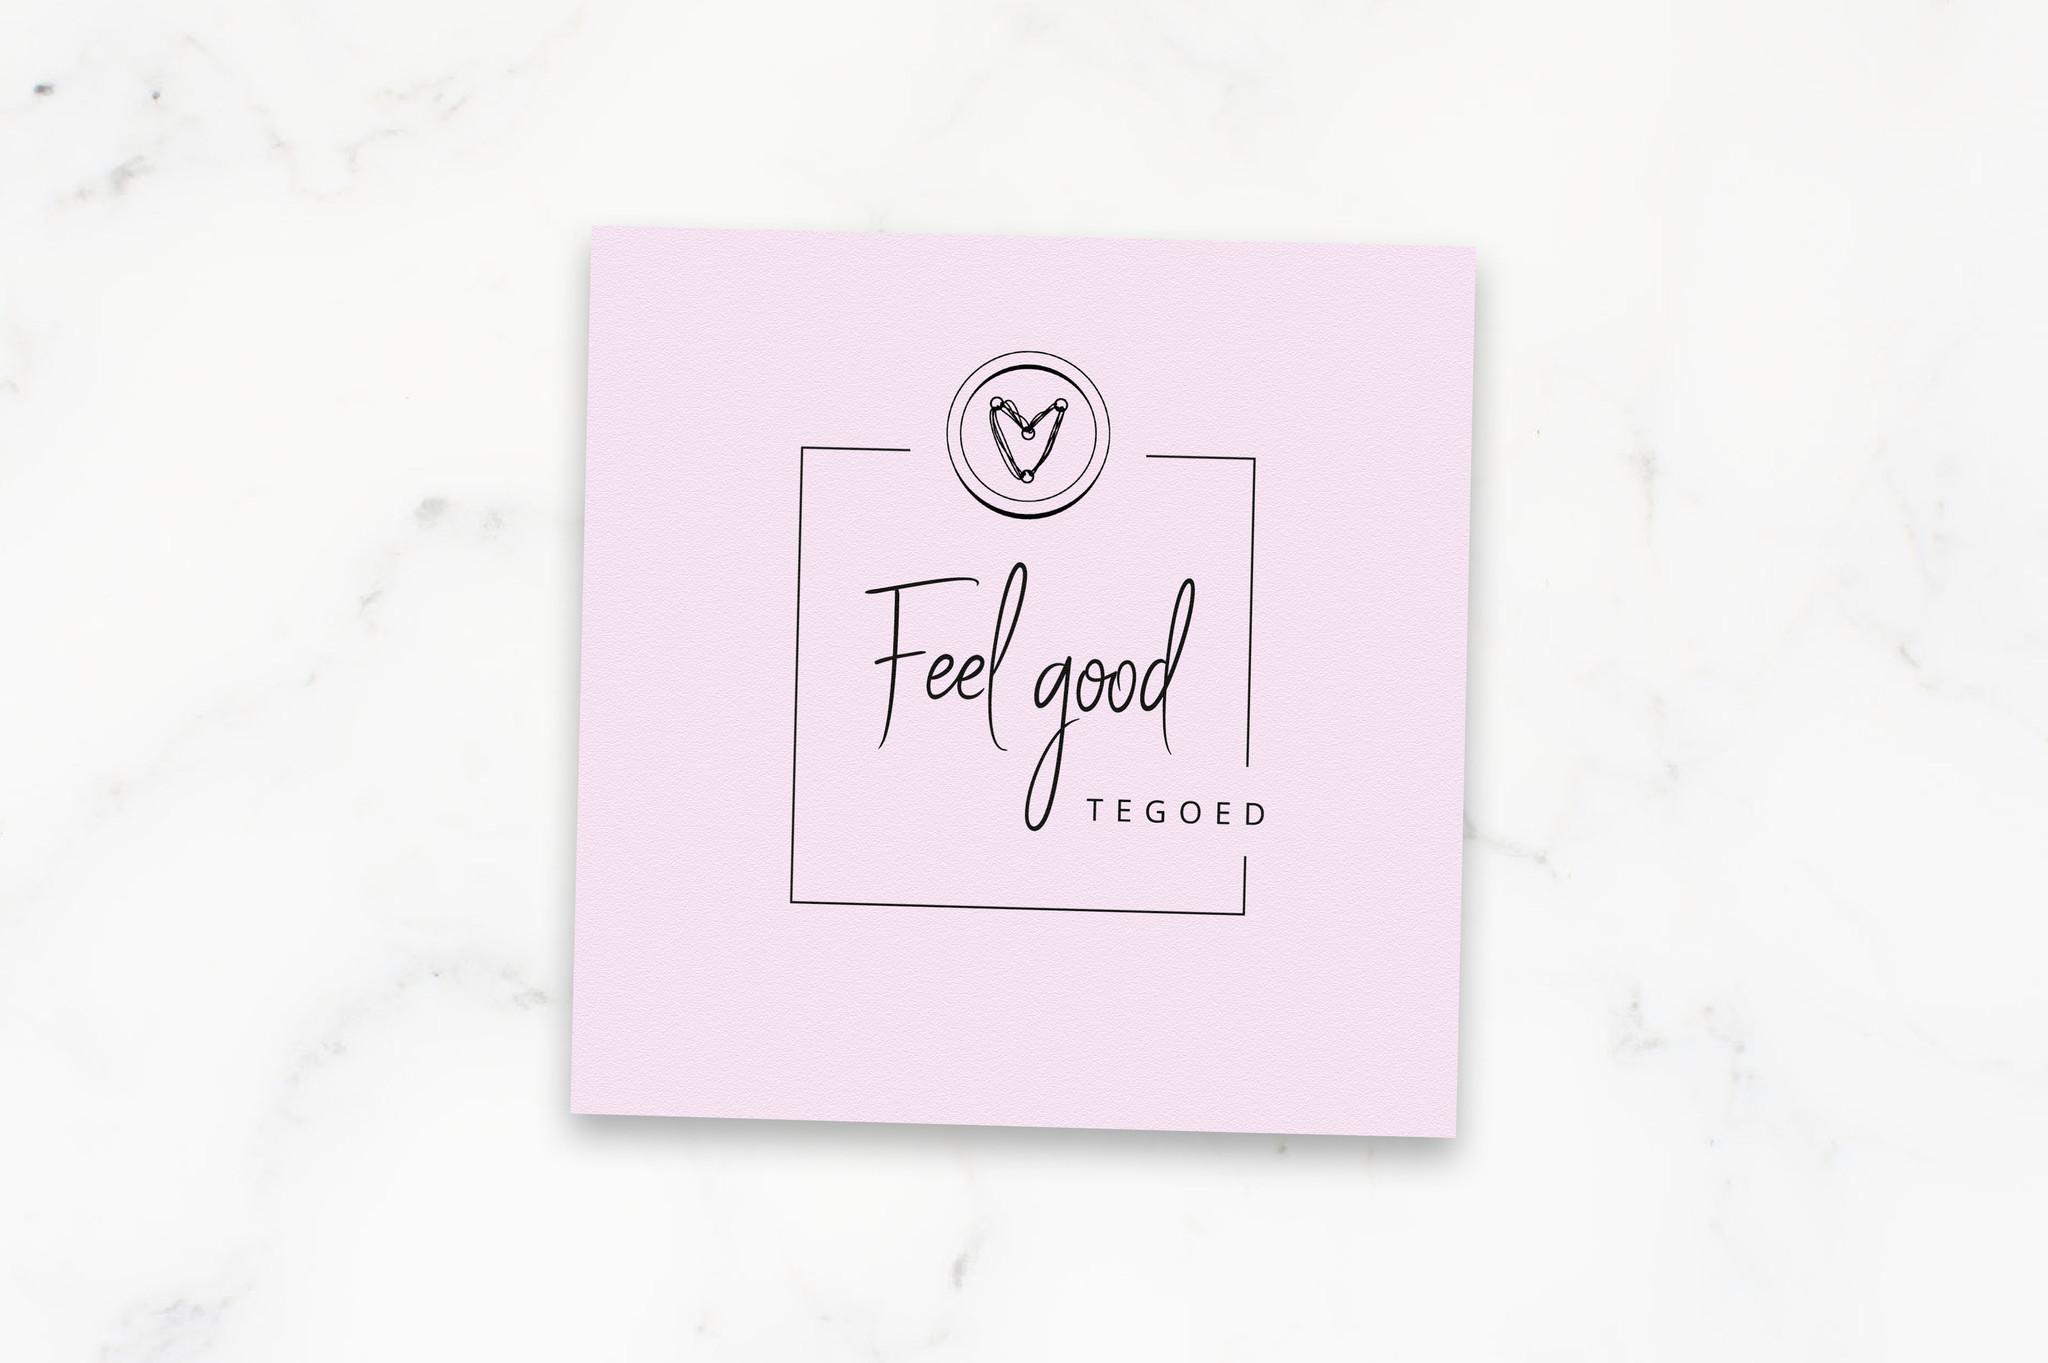 Feel Good Tegoed 'in je mailbox' 5euro